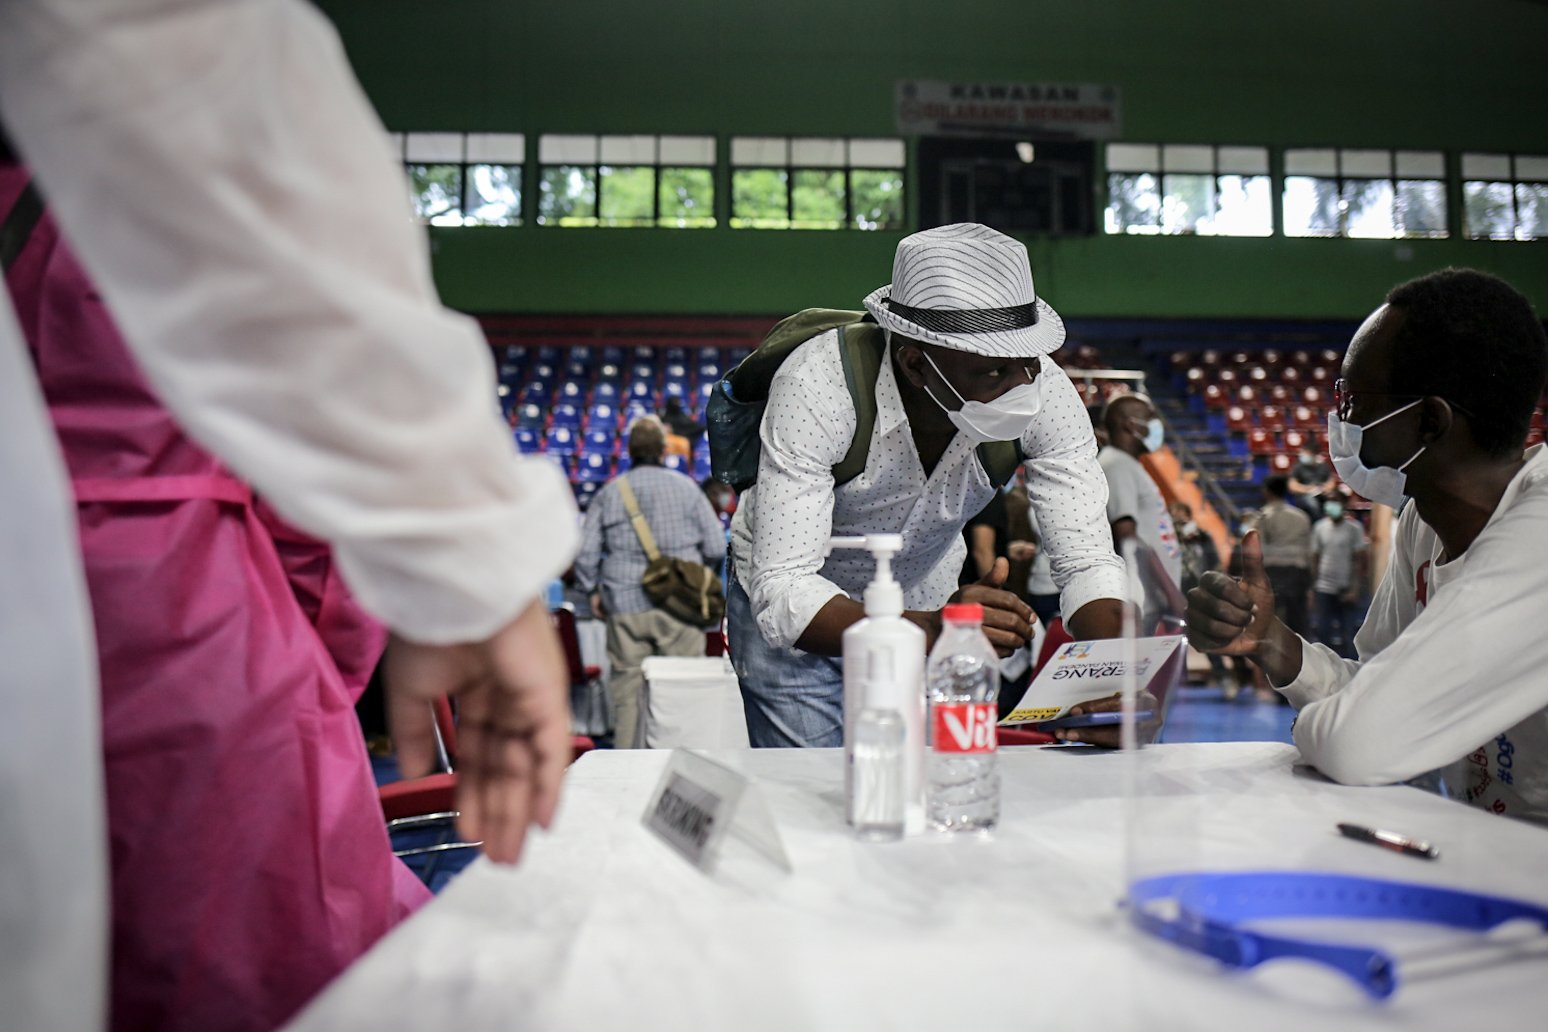 Para pencari suaka menunjukkan kartu identitas saat screening untuk mengikuti vaksinasi COVID-19 di GOR Bulungan, Jakarta Selatan, Kamis (7/10/2021). \r\nVaksinasi tersebut digelar atas kerja sama Pemprov DKI Jakarta, UNHCR dan Kadin Indonesia. \r\nSebanyak 600 vaksin dosis pertama disediakan dalam vaksinasi tersebut.